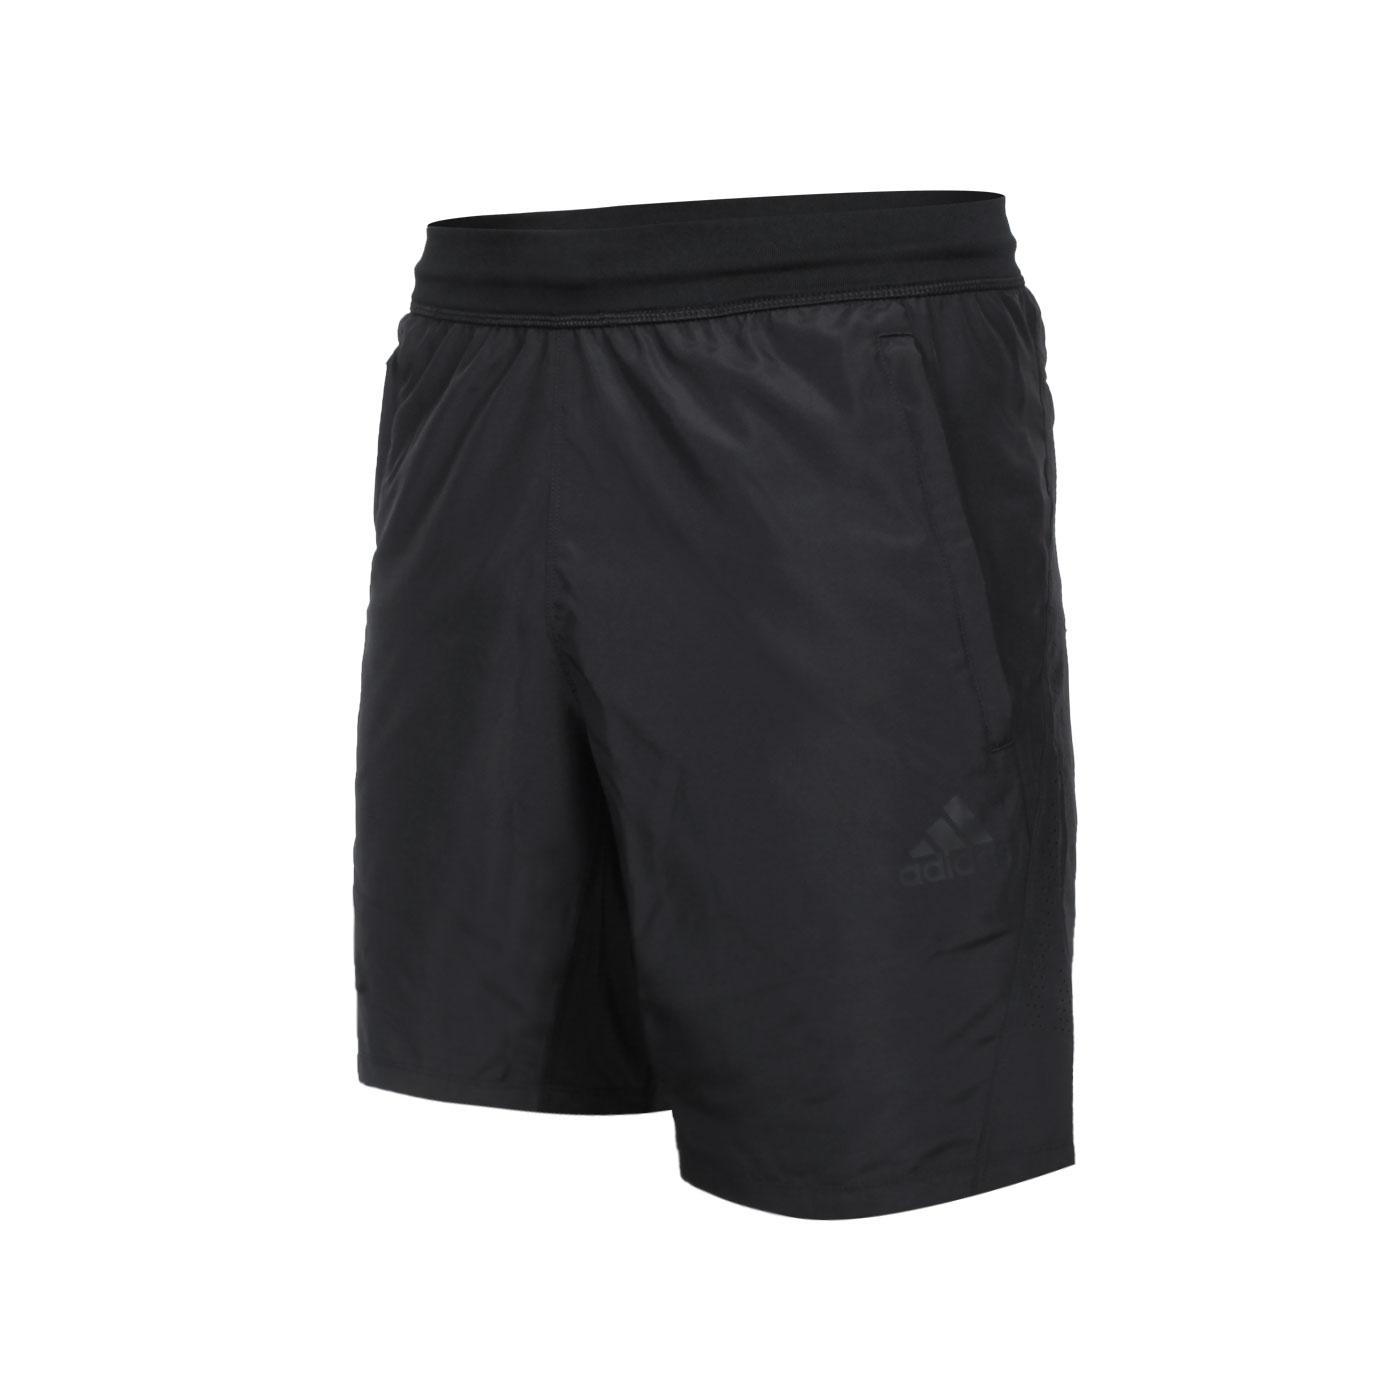 ADIDAS 男款運動短褲 FM2146 - 黑